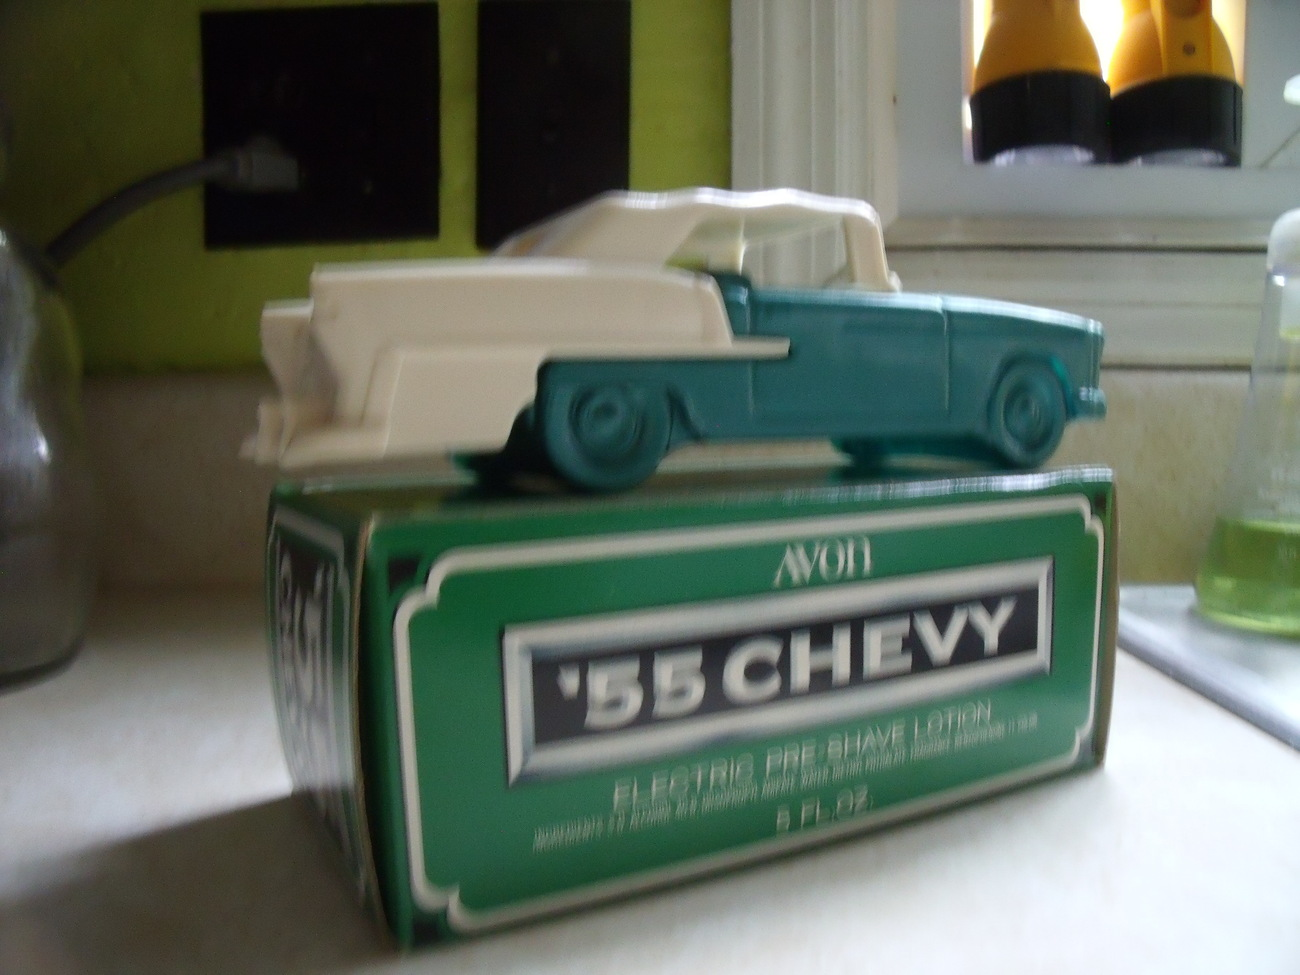 Avon 1955 Chevrolet Convertible Bottle NIB